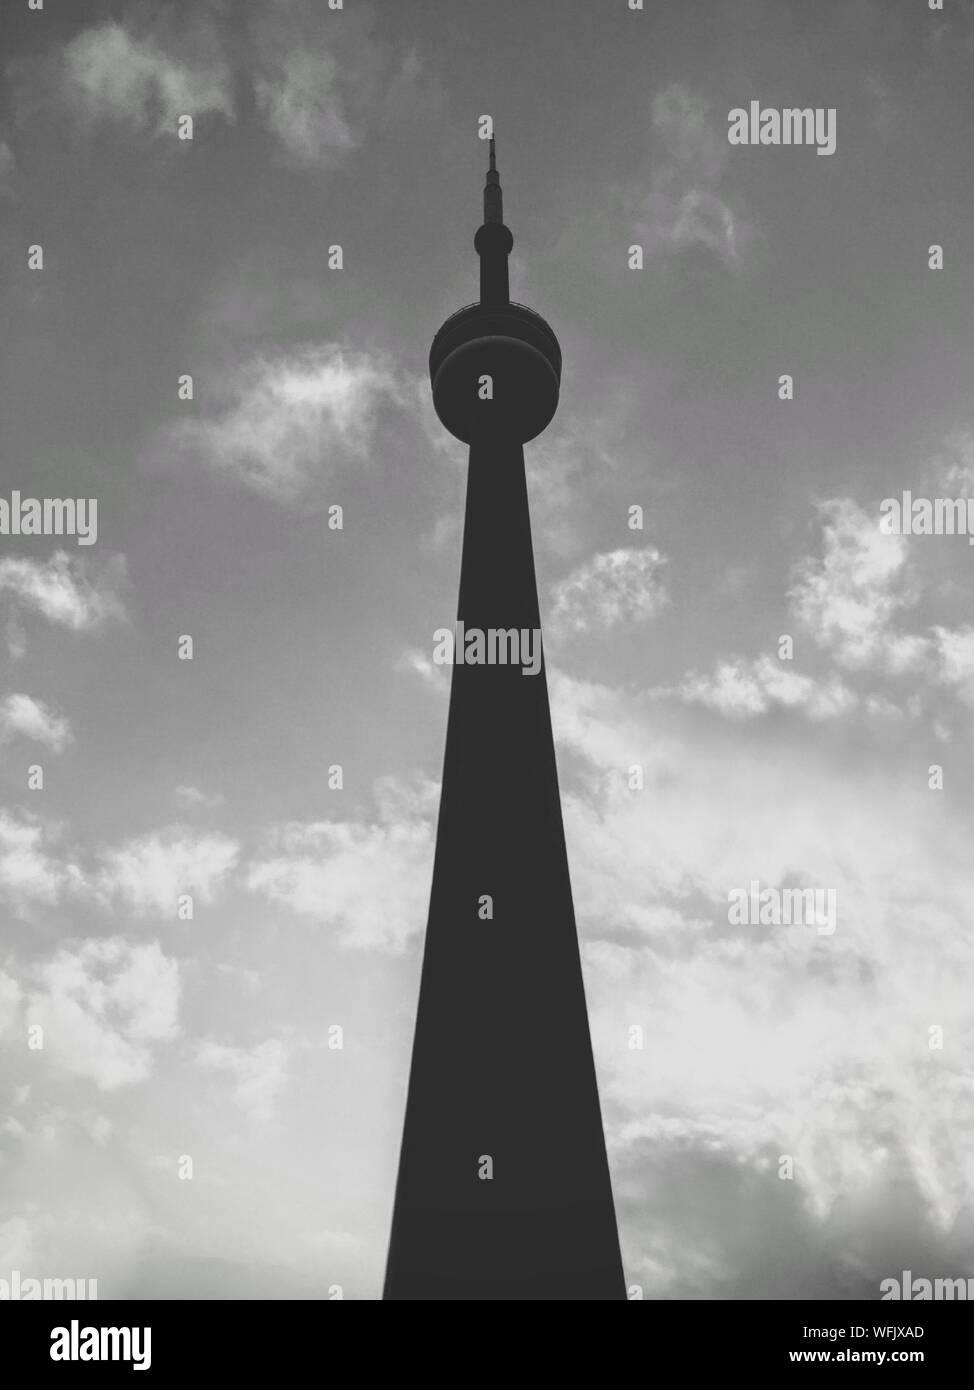 Niedrigen Winkel Ansicht des Cn Tower gegen bewölktem Himmel Stockfoto